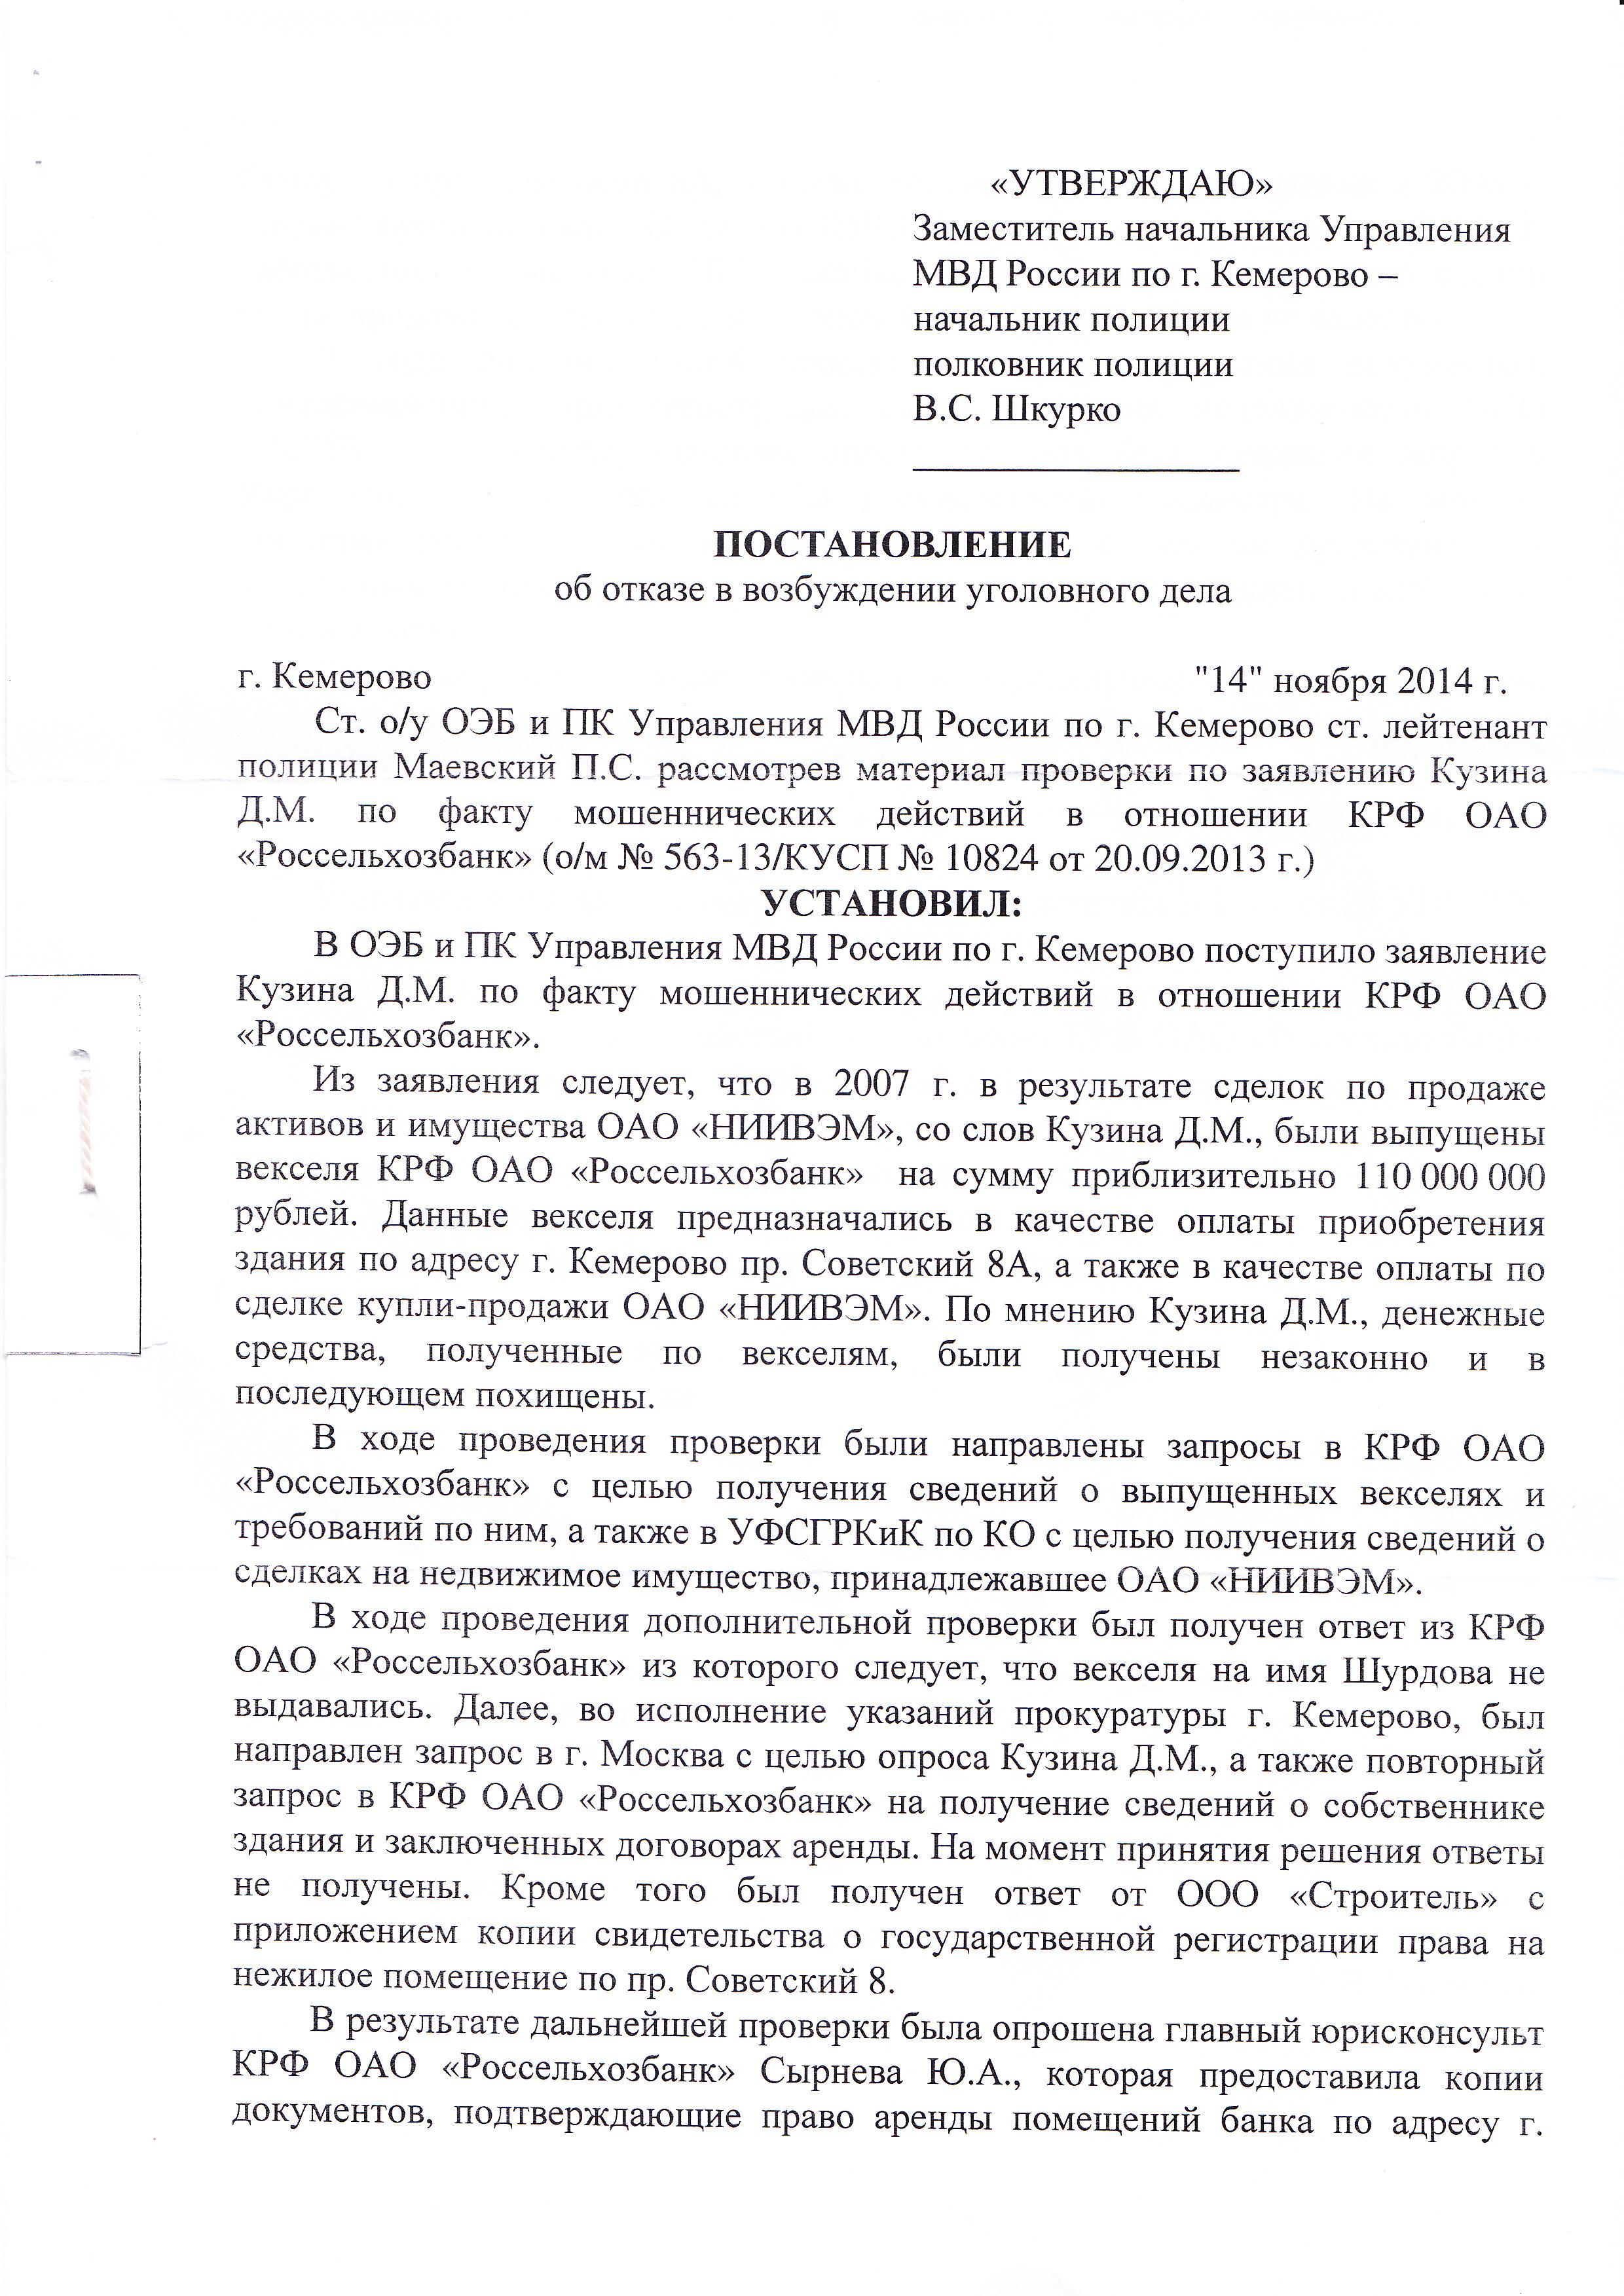 Постановление об отказе от 14 11 2014 - 1 л.